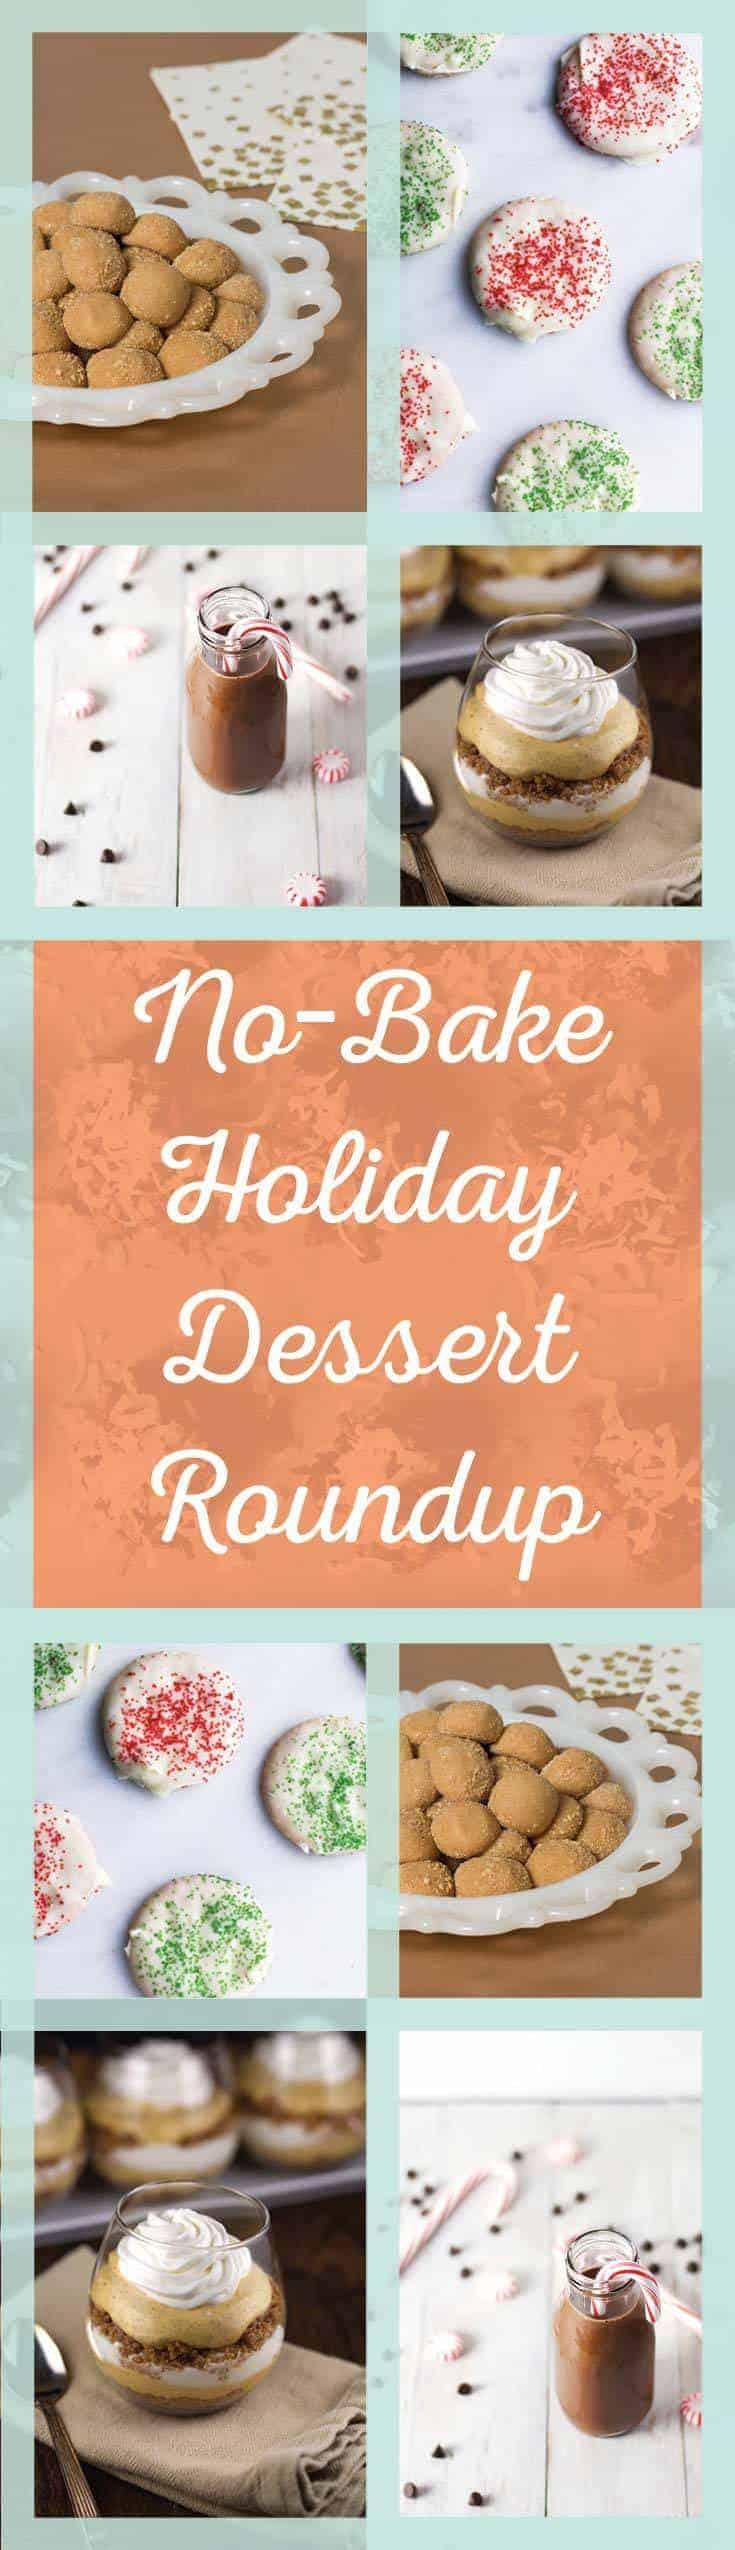 20 No-Bake Holiday Desserts | No Bake Desserts | Cup of Zest